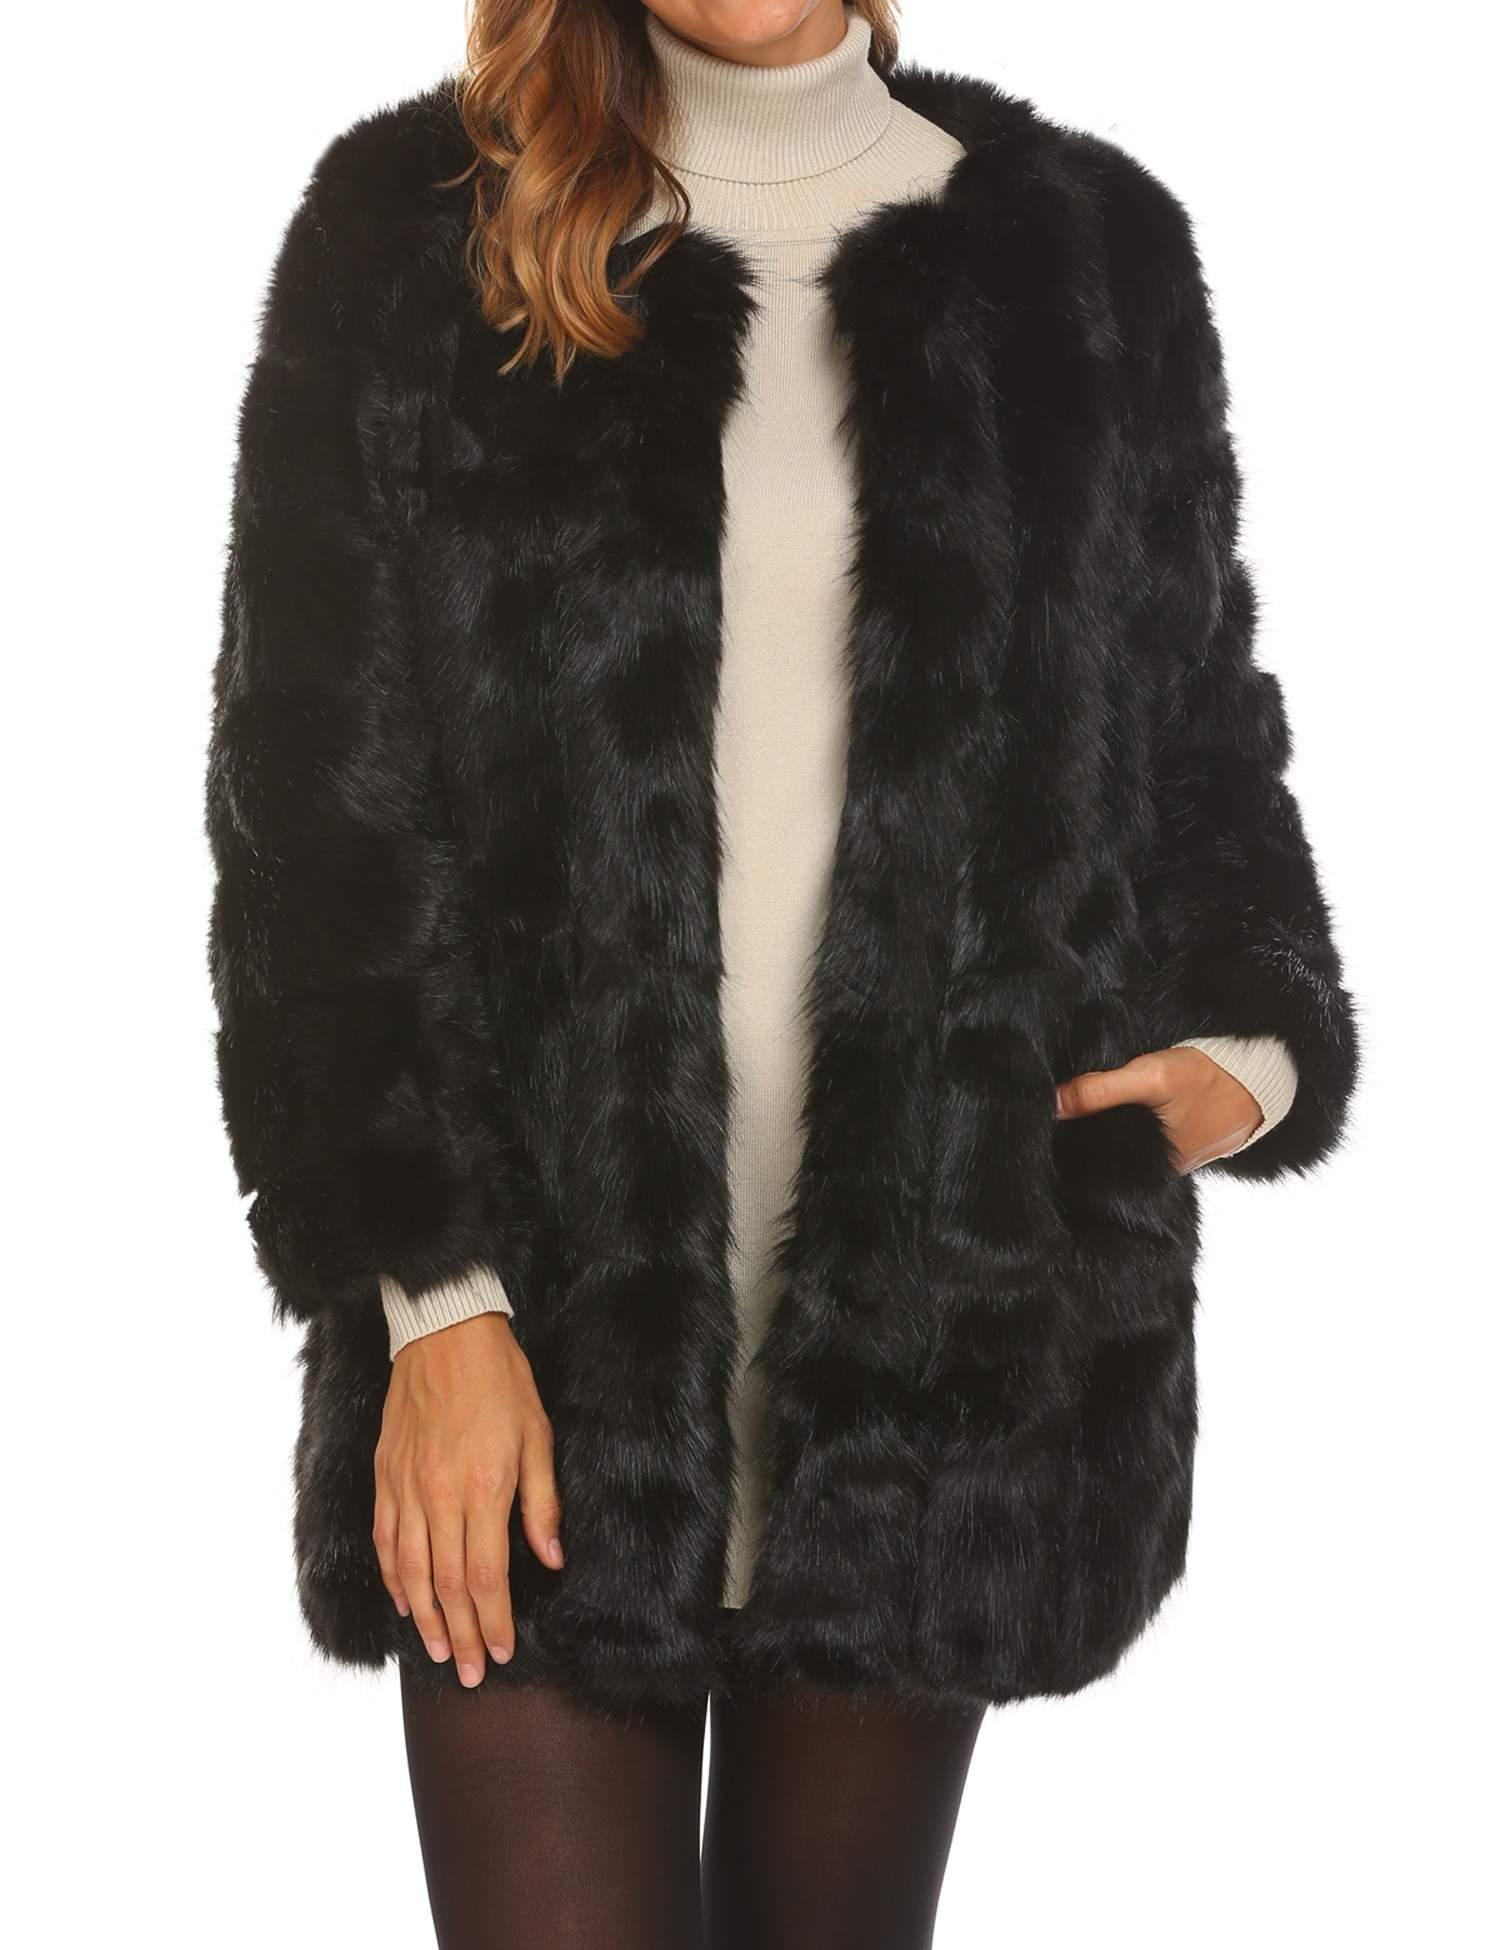 Soteer Women's Thick Outwear Winter Warm Long Faux Fur Coat Jackets Black XL by Soteer (Image #1)